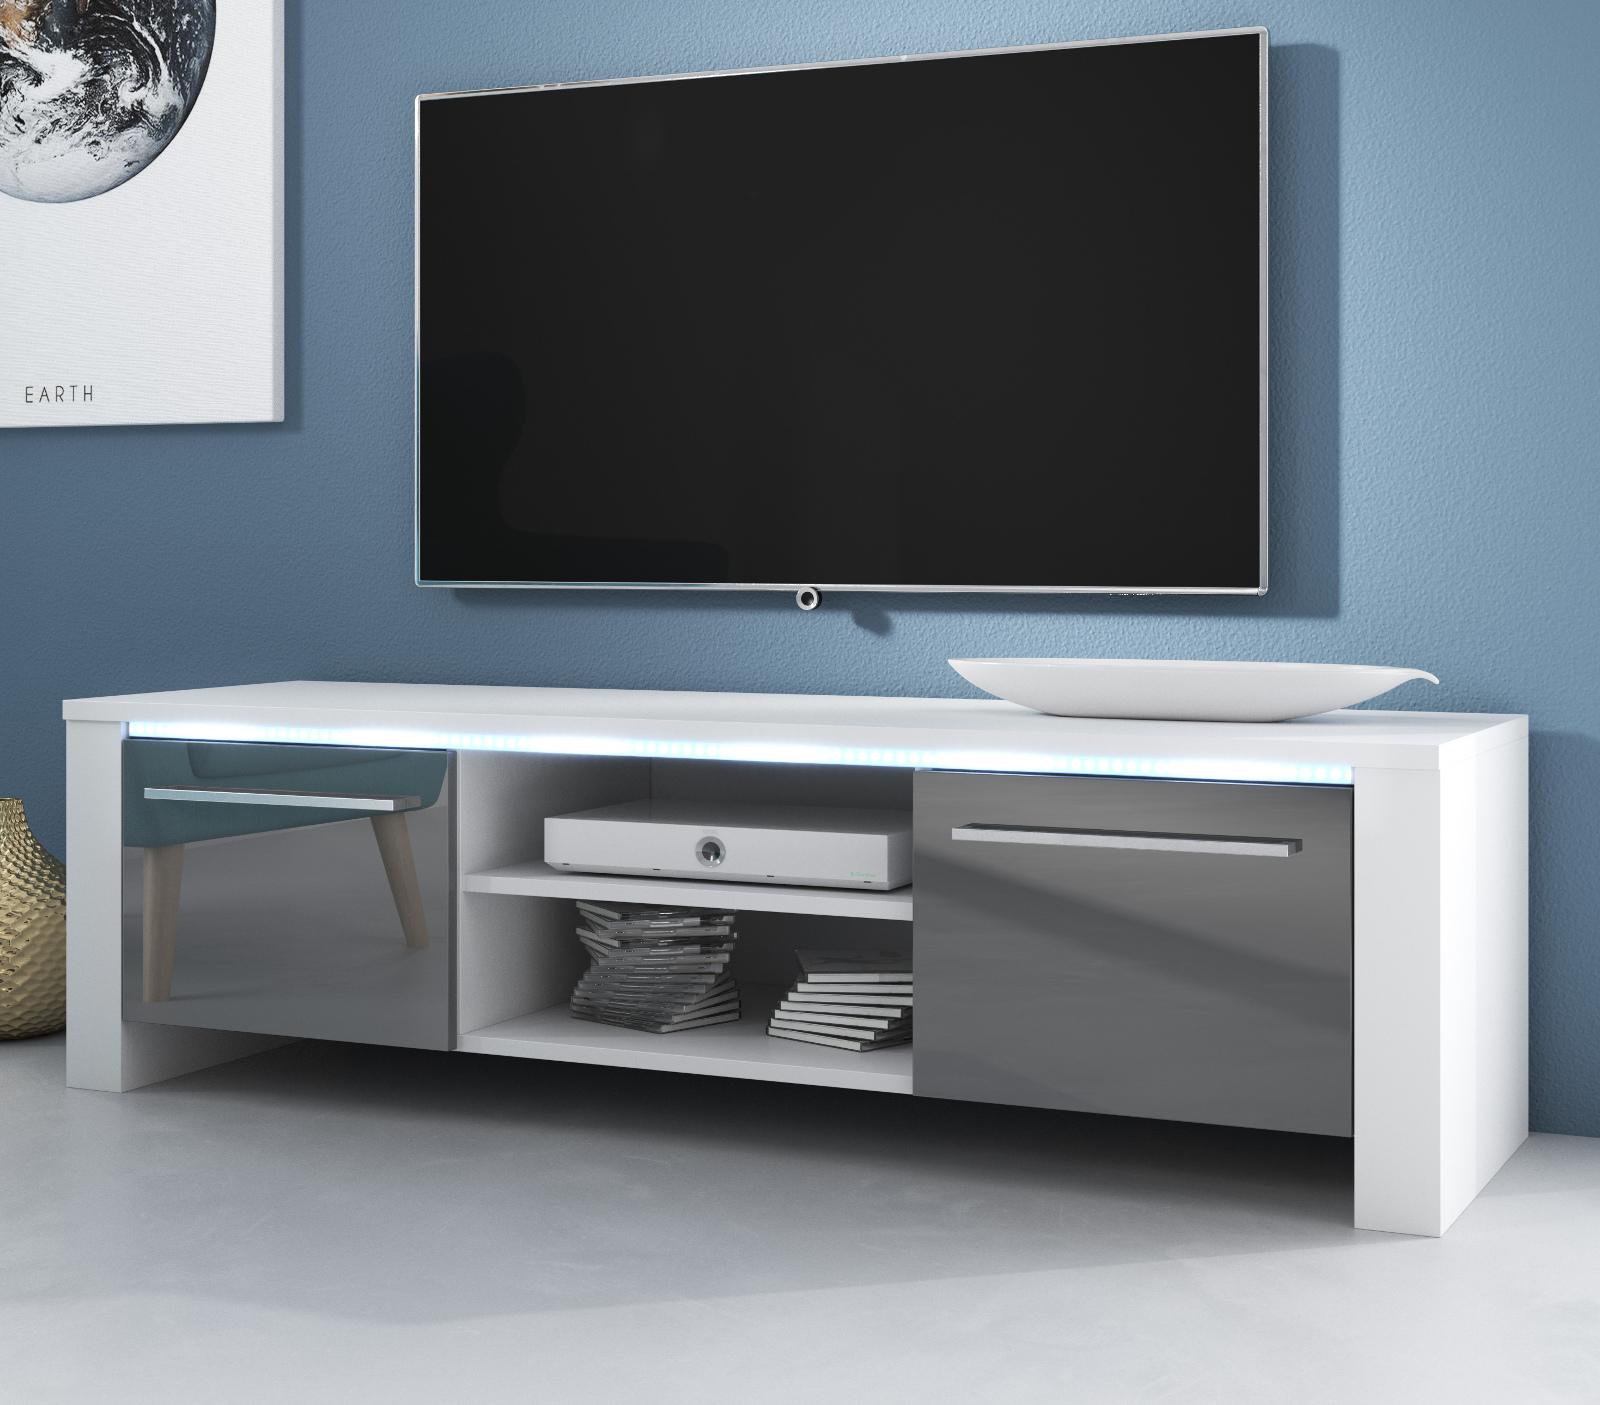 büromöbel eckregal regal in vier dekoren logo14 - designermöbel